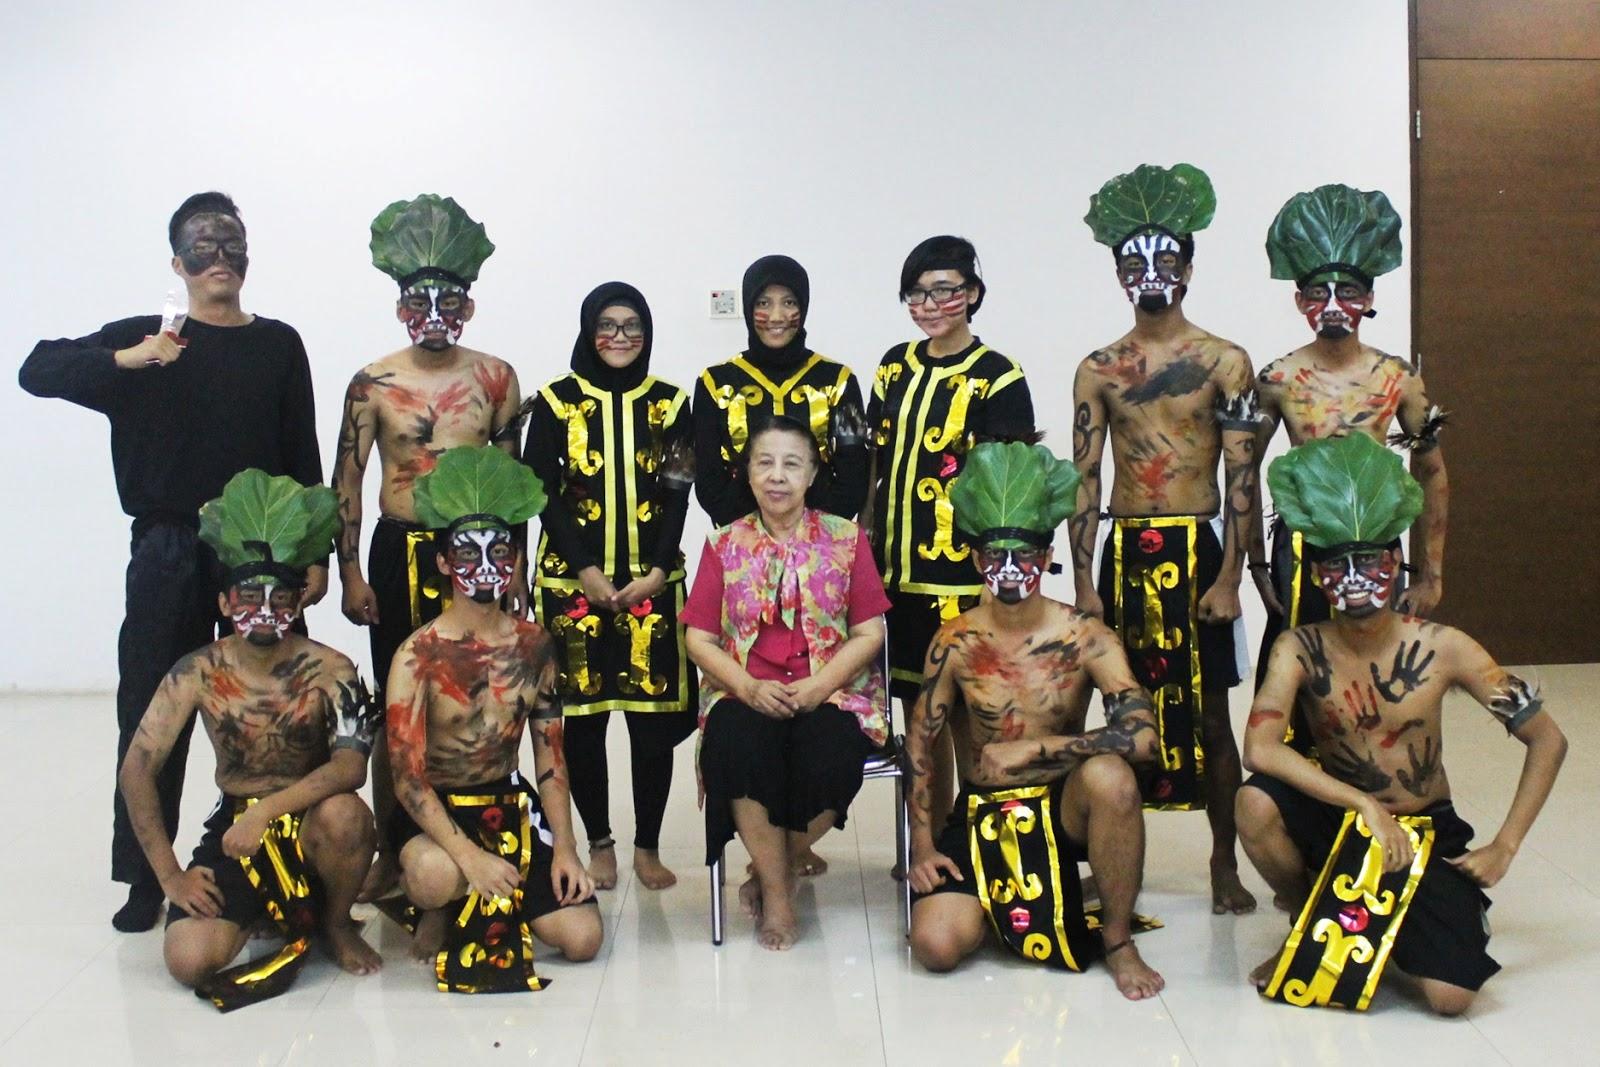 Ocir - Hamdani - Jeki wearing drama property - Roni